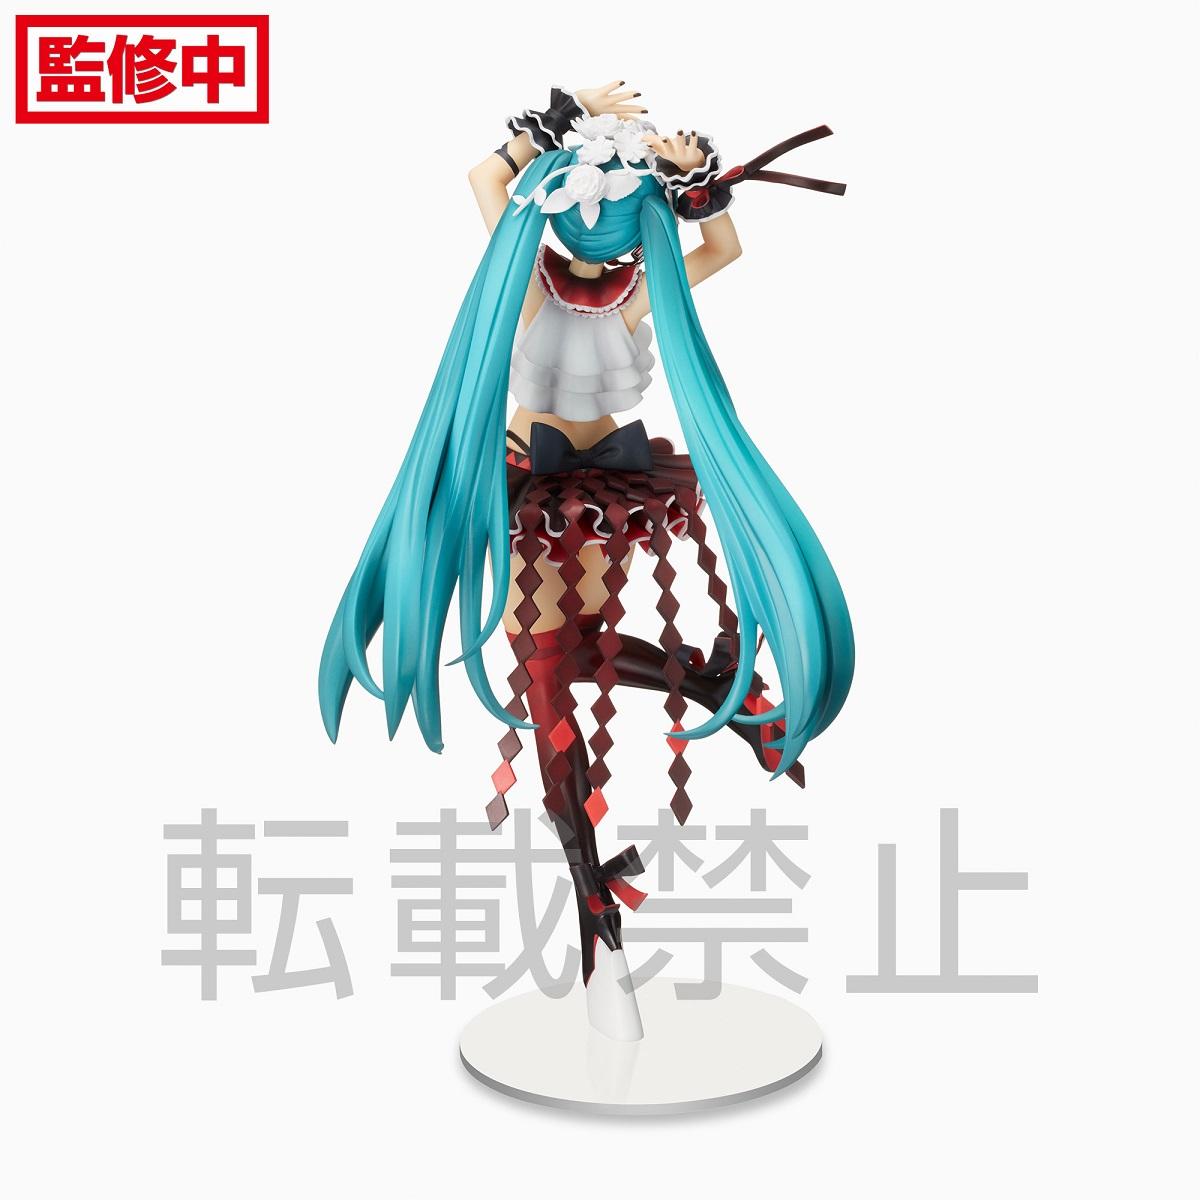 Hatsune Miku Project DIVA MEGA 39's Ver Prize Figure